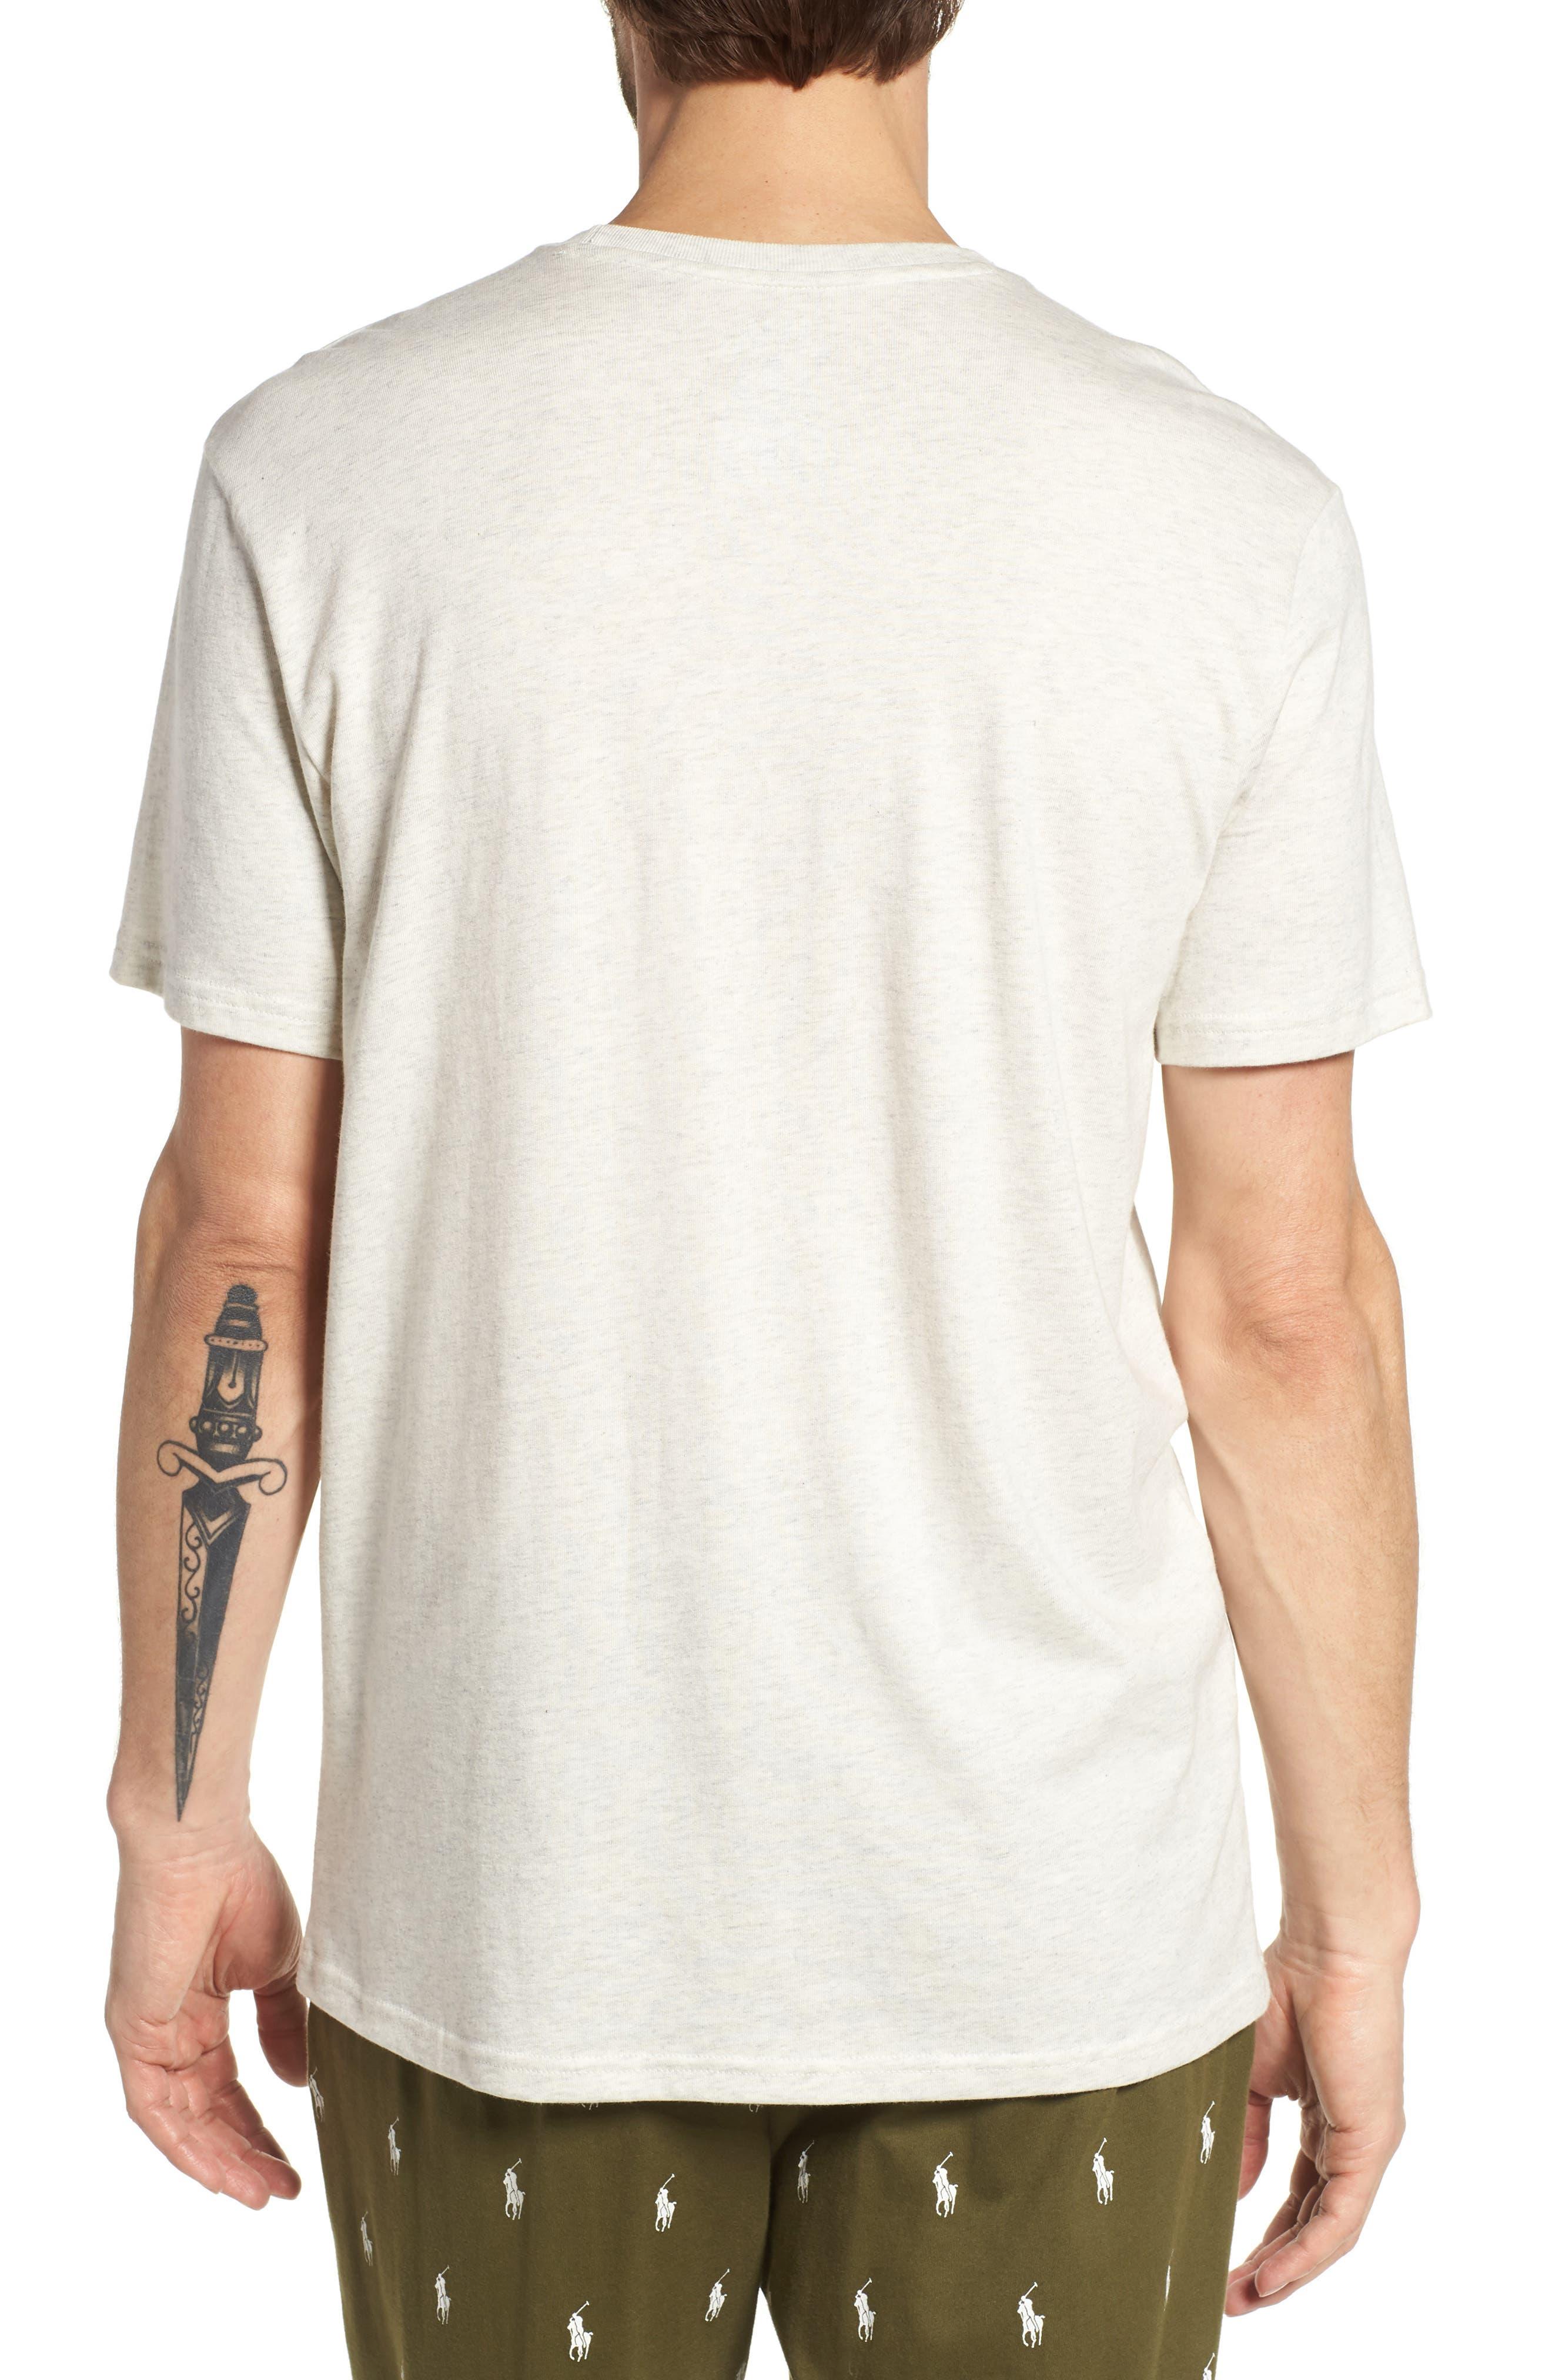 Supreme Comfort Crewneck T-Shirt,                             Alternate thumbnail 2, color,                             026